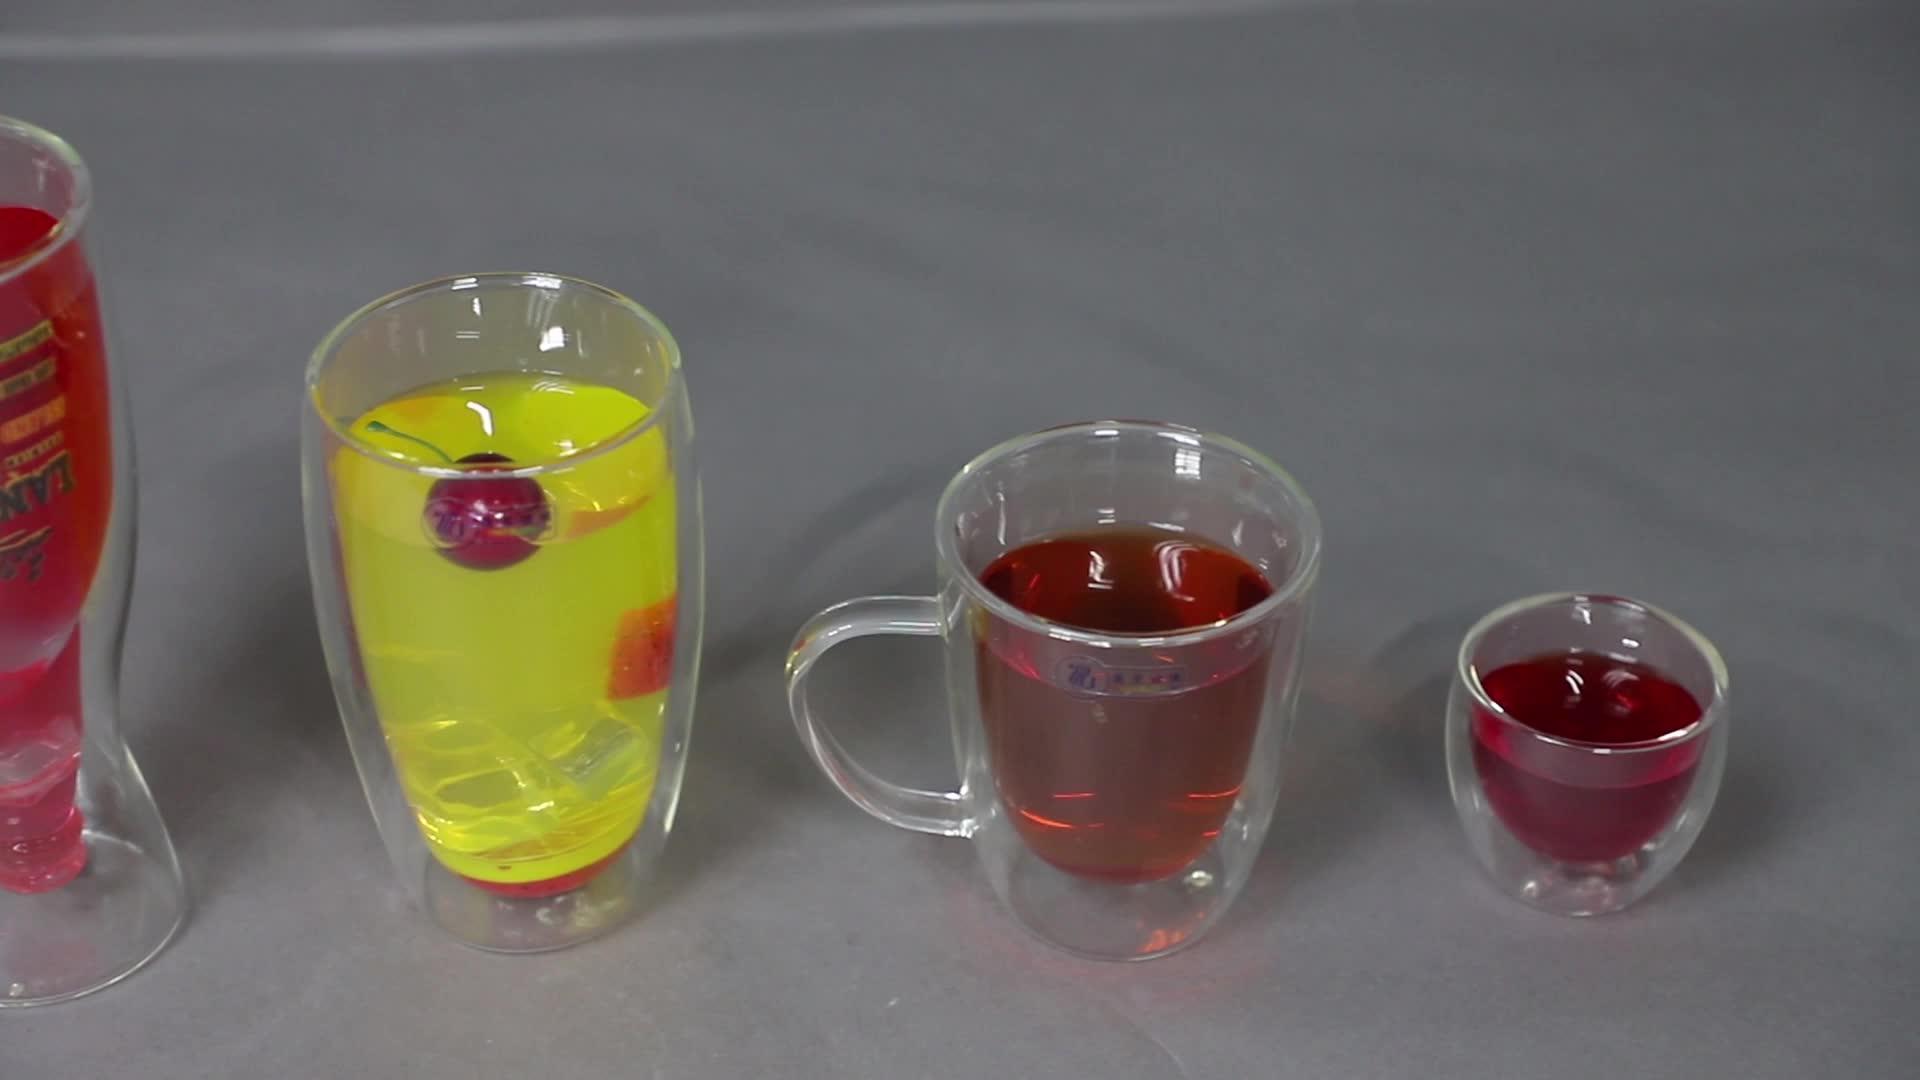 450 ml crystal handgemaakte clear transparante dubbele muur pyrex borosilicaatglas cup glaswerk met rode silicon base